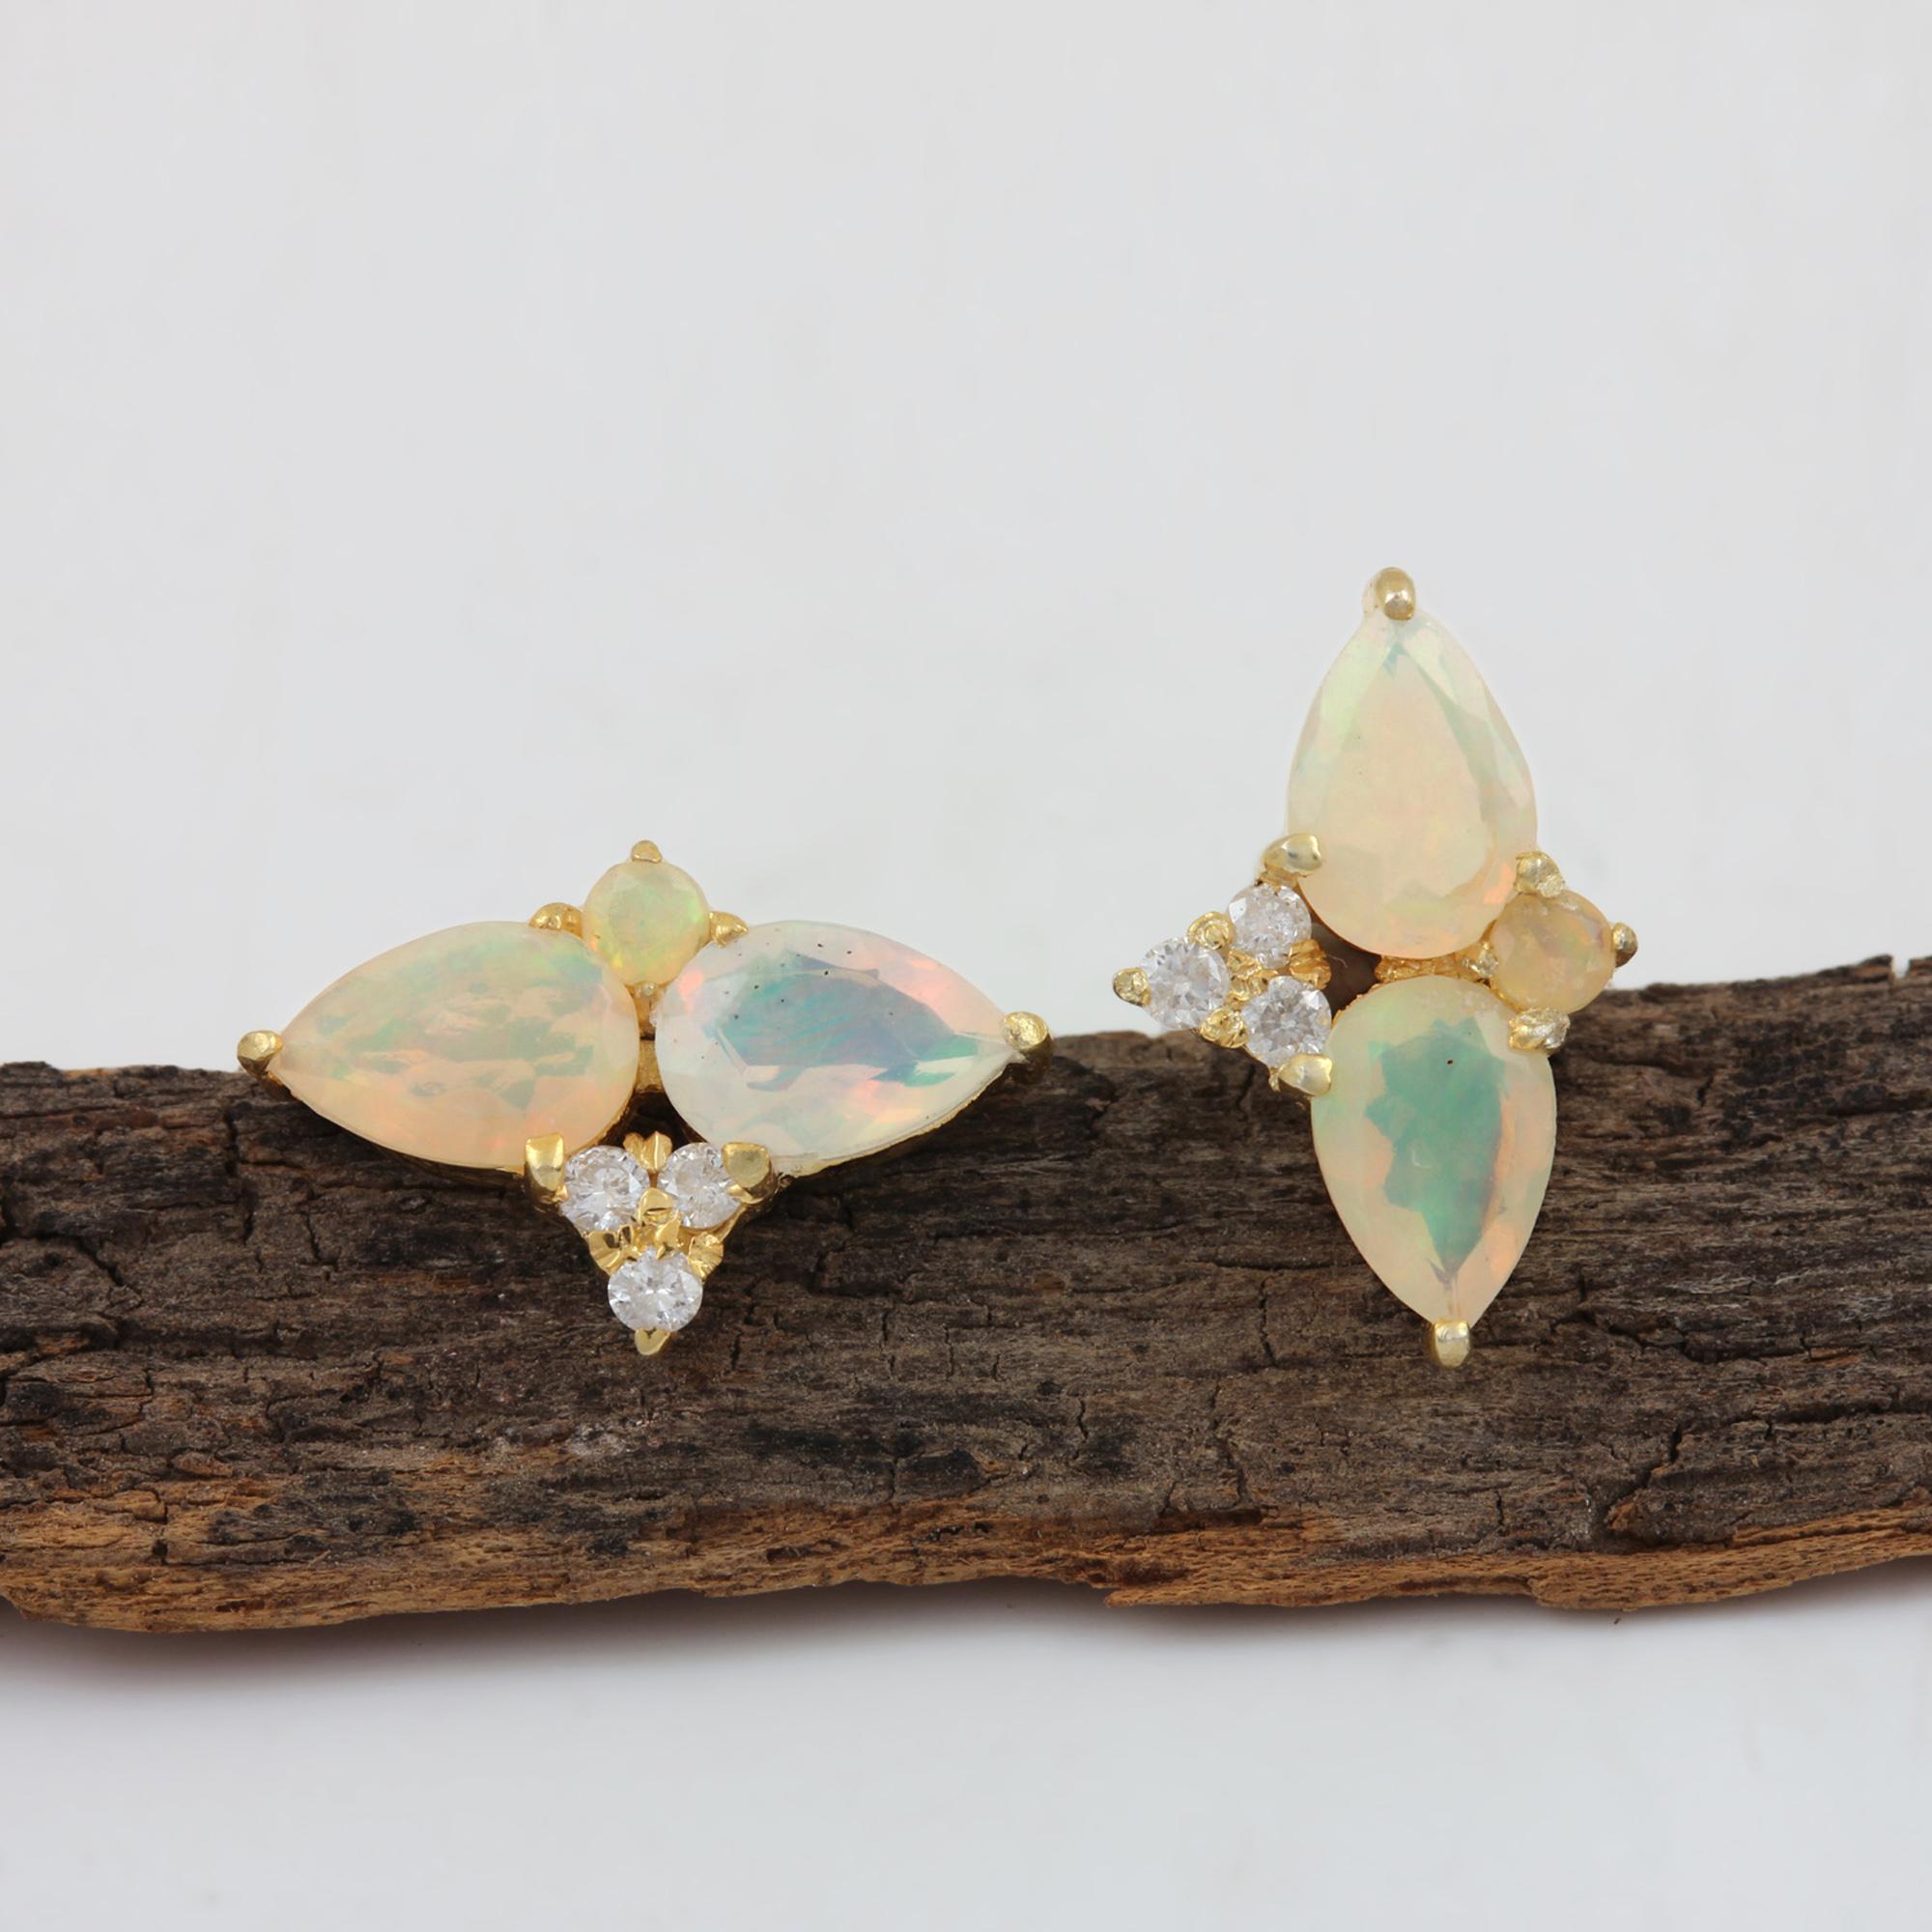 Natural Opal Minimalist Stud Earrings 14k Solid Gold Diamond Jewelry